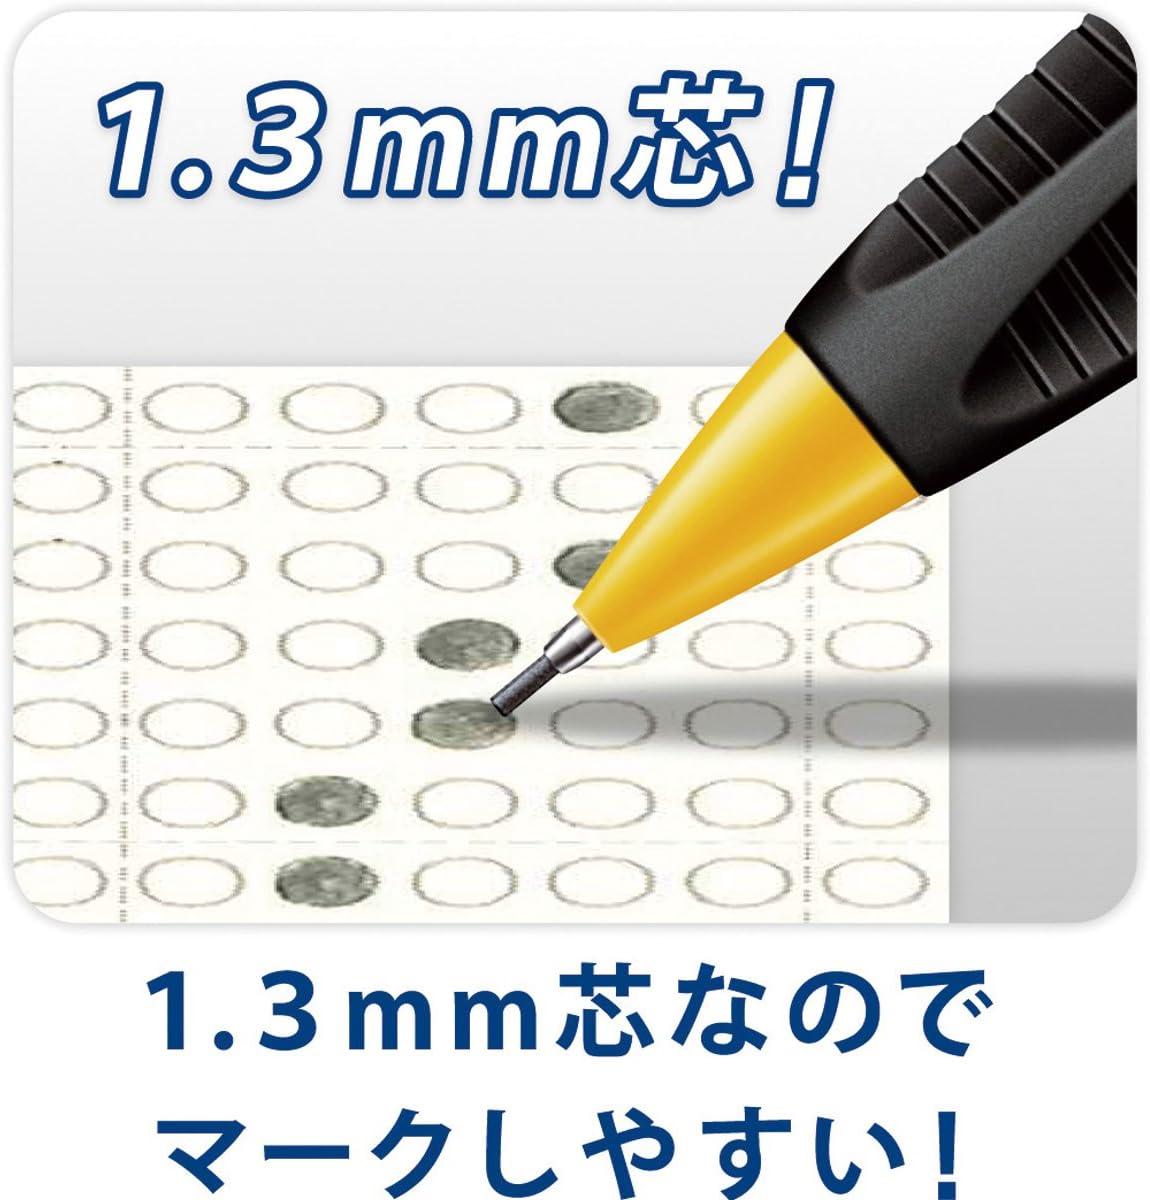 Yellow Body 771 Mechanical Pencil 1.3 mm - New